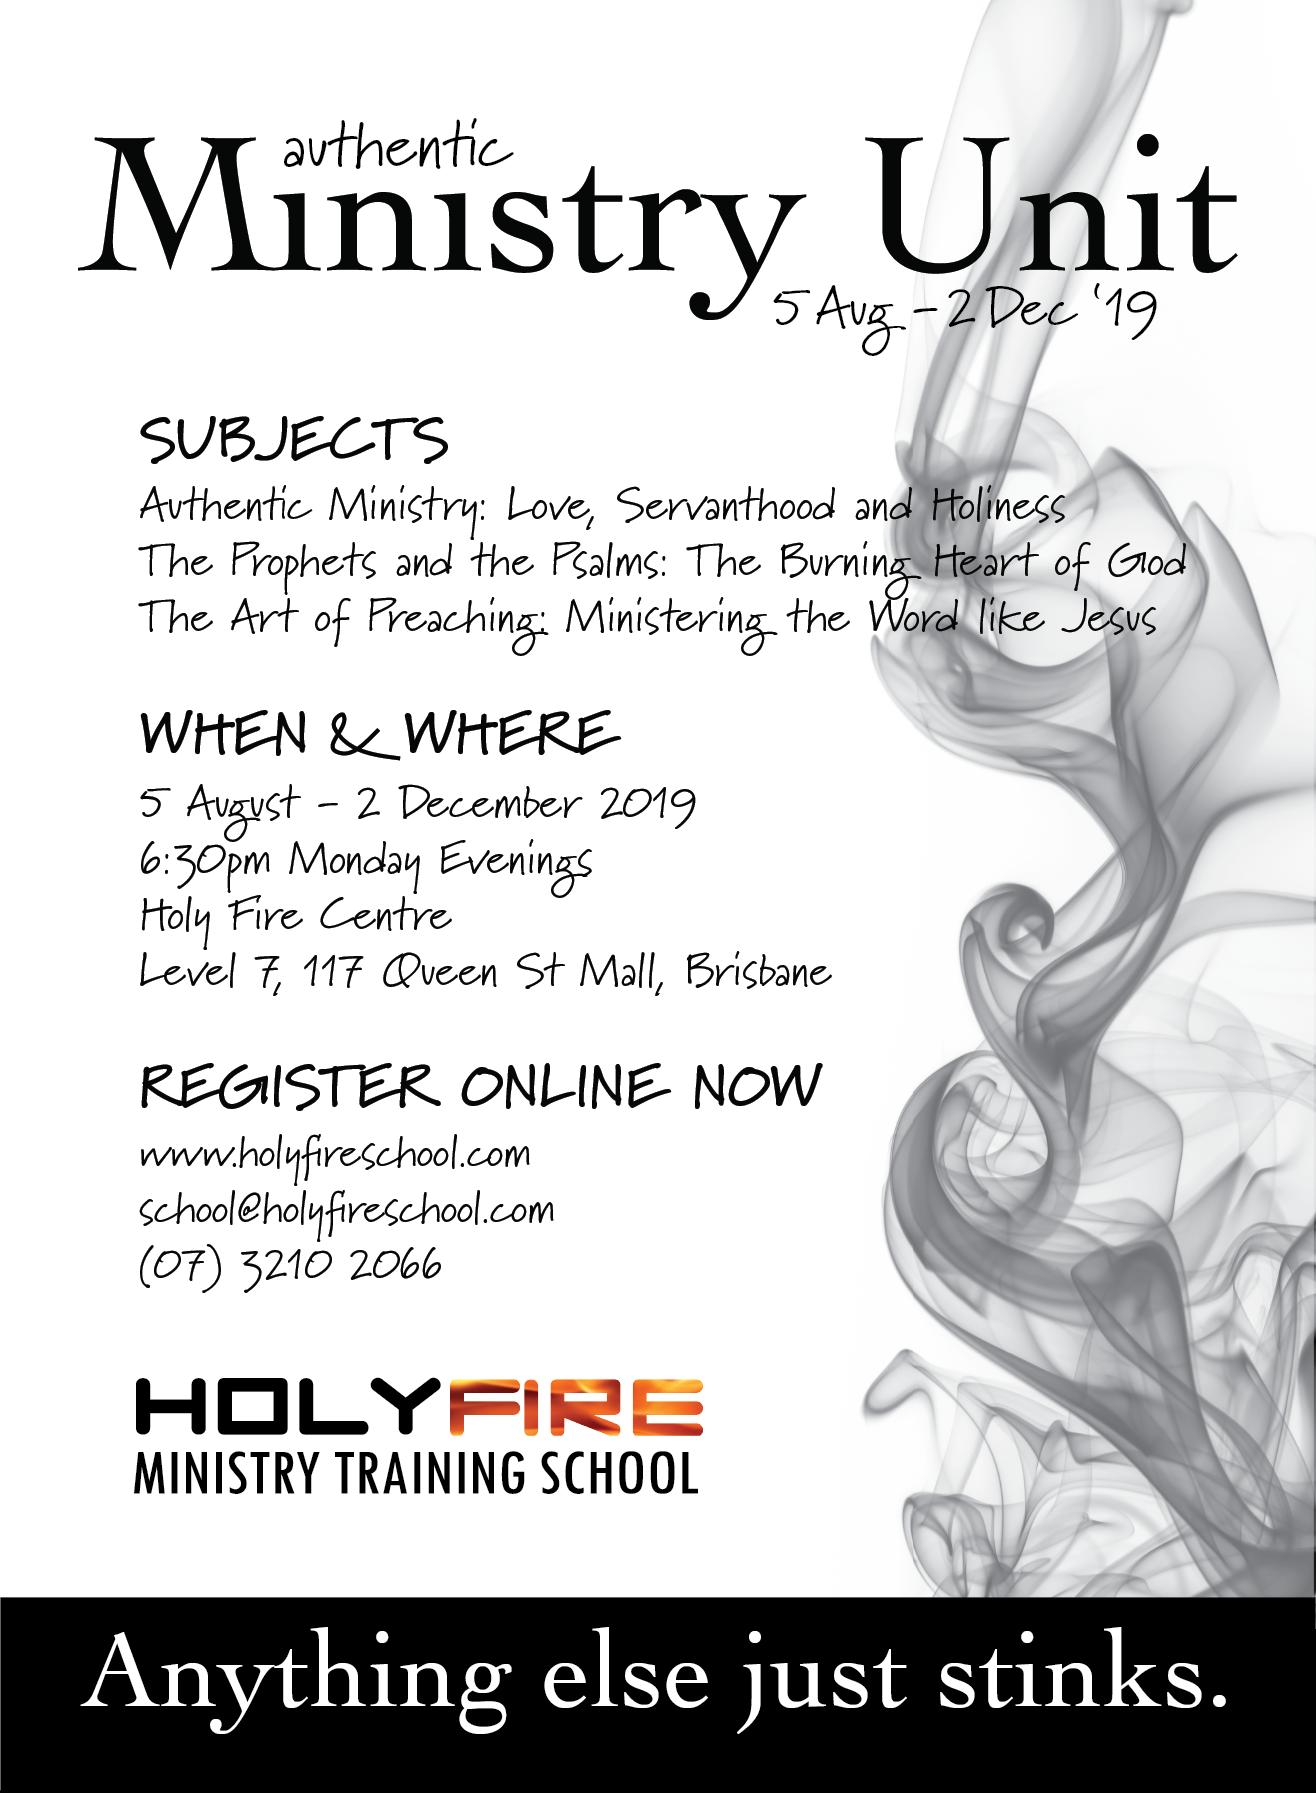 Ministry Unit 2019 Postcard S2 XL.png